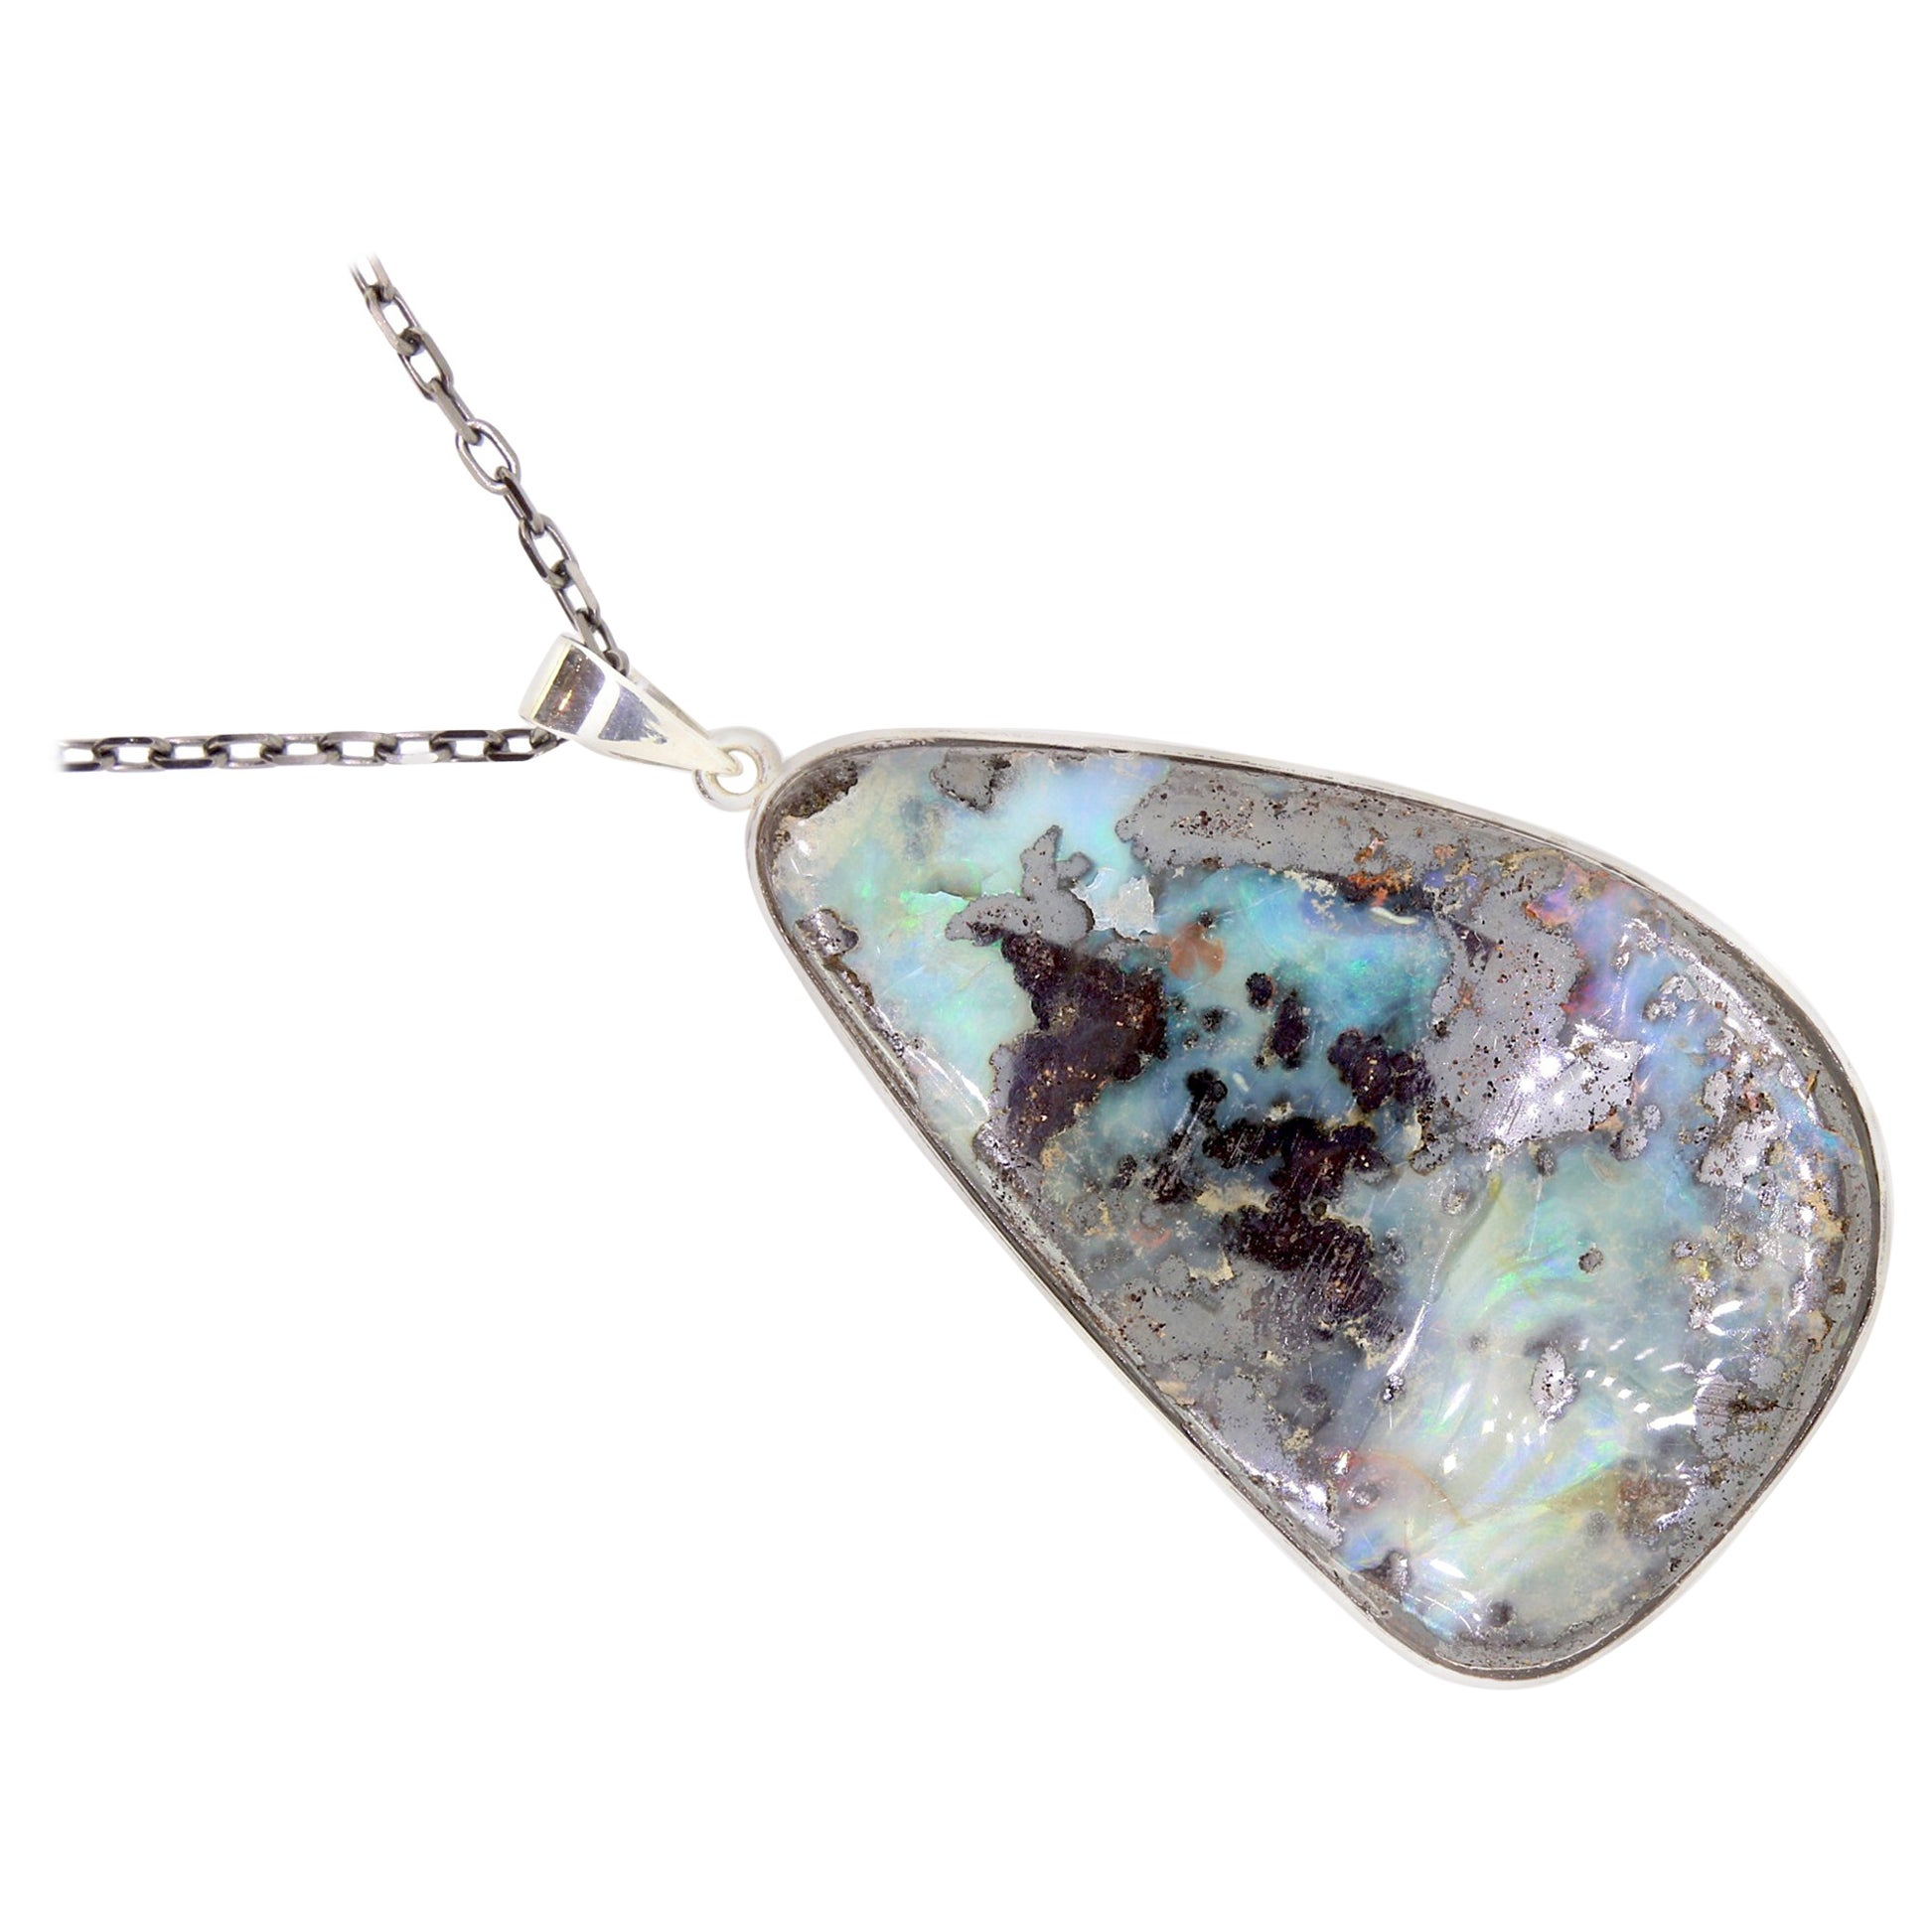 Blue Opal Pendant Necklace 925 Sterling Silver